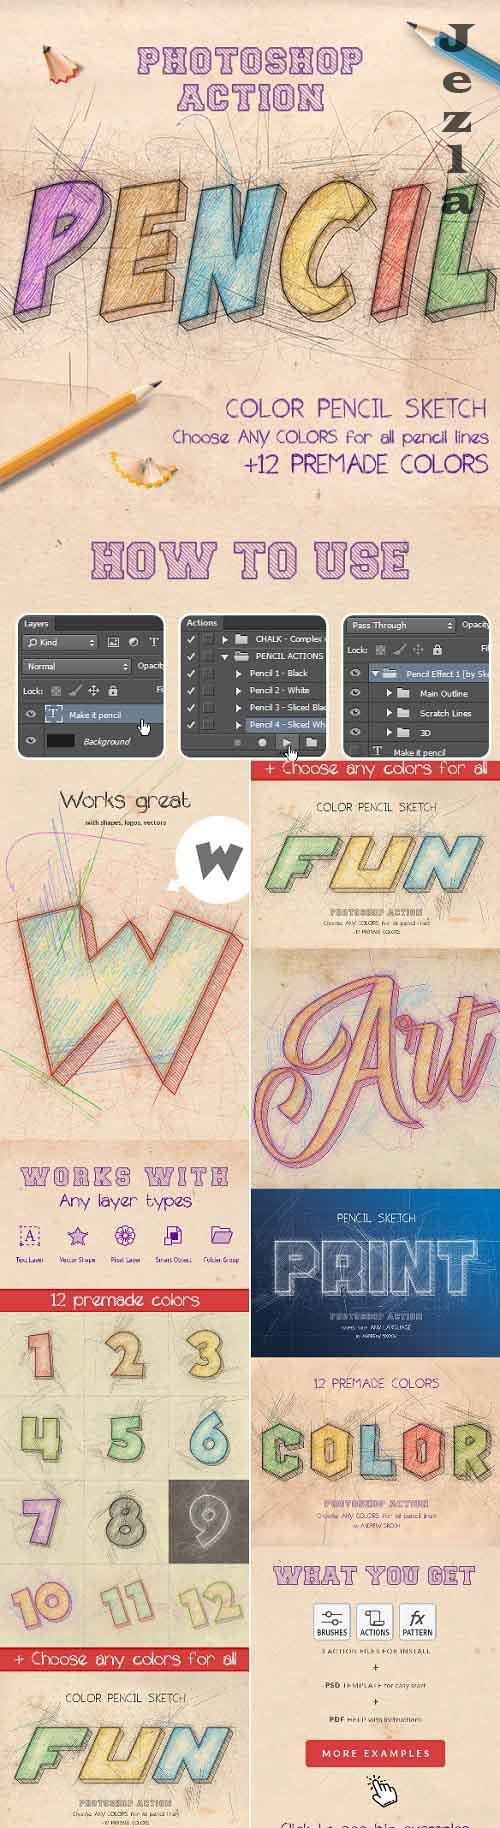 Color Pencil Sketch - PHSP Actions 27194012